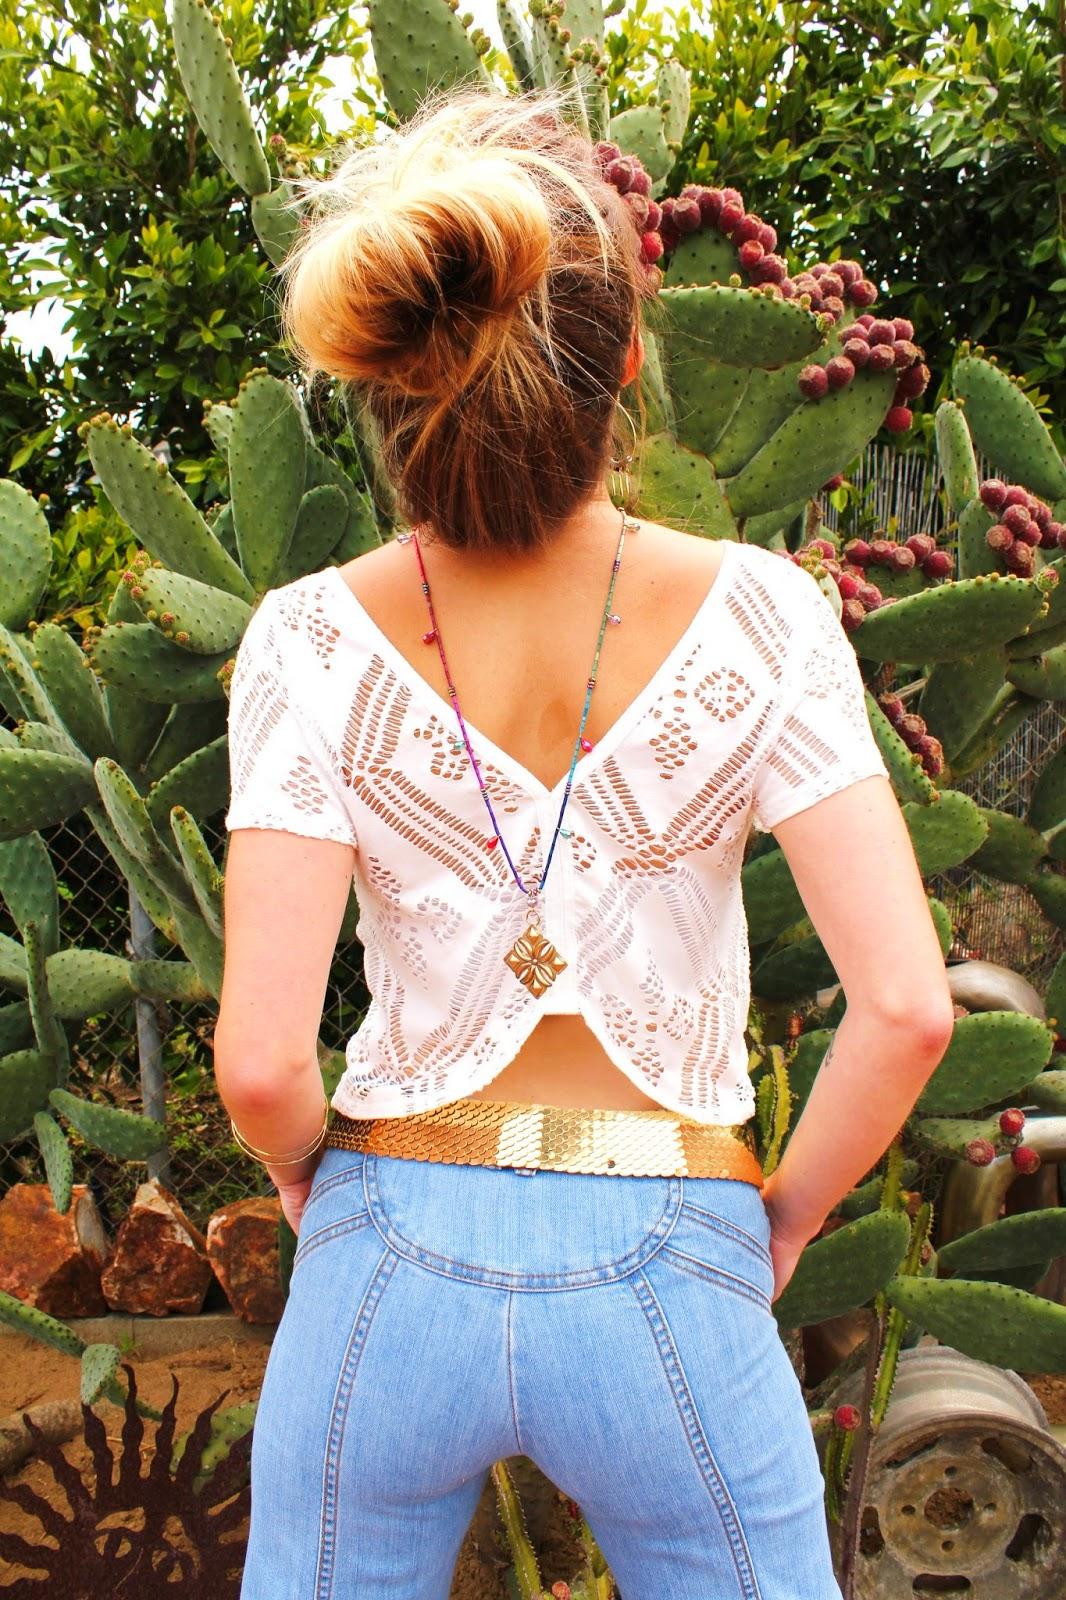 Lilygirl Jewelry In The Gypsy Garden